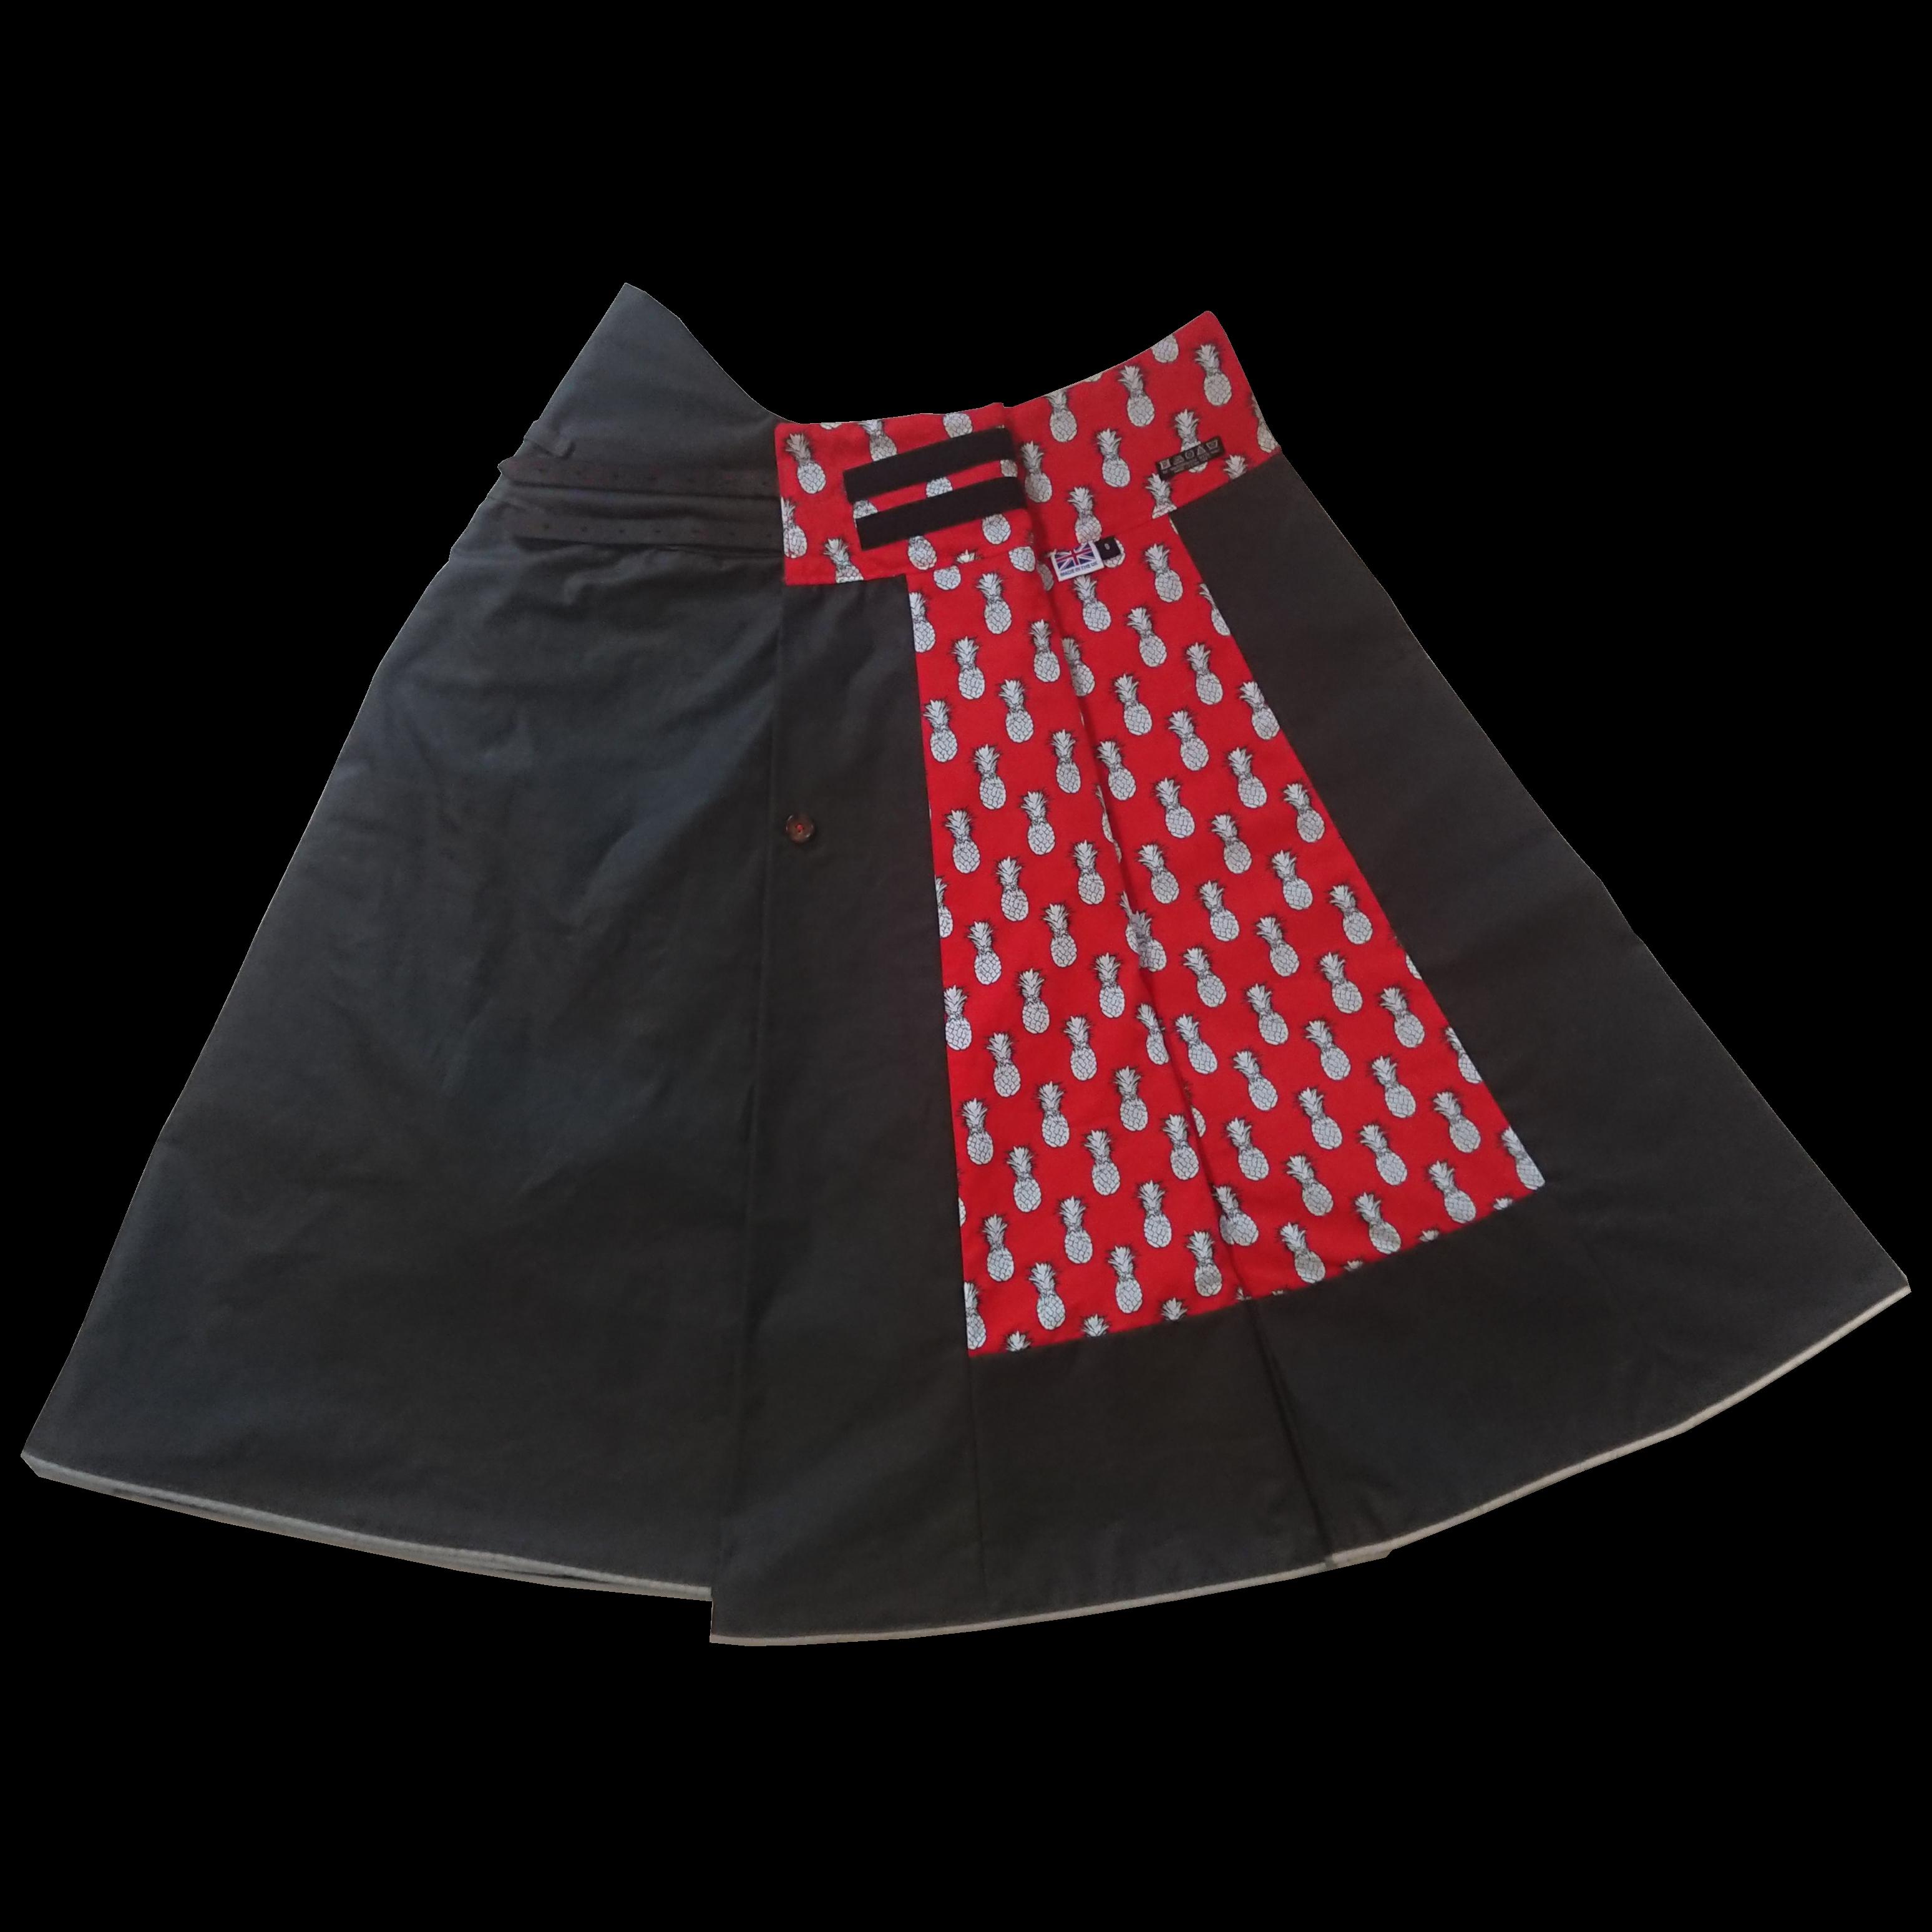 Tropicana skirt